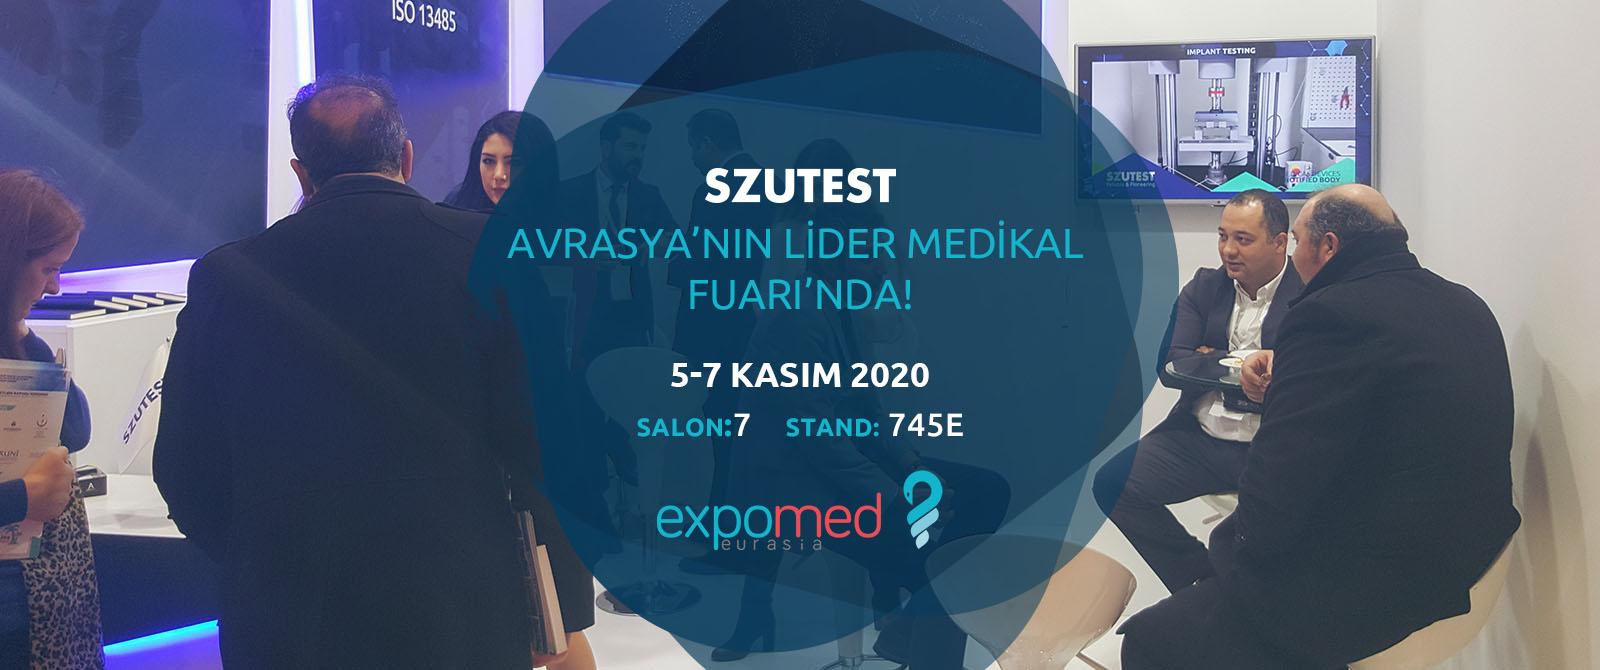 Expomed-Szutest-2020-Web-Banner-1